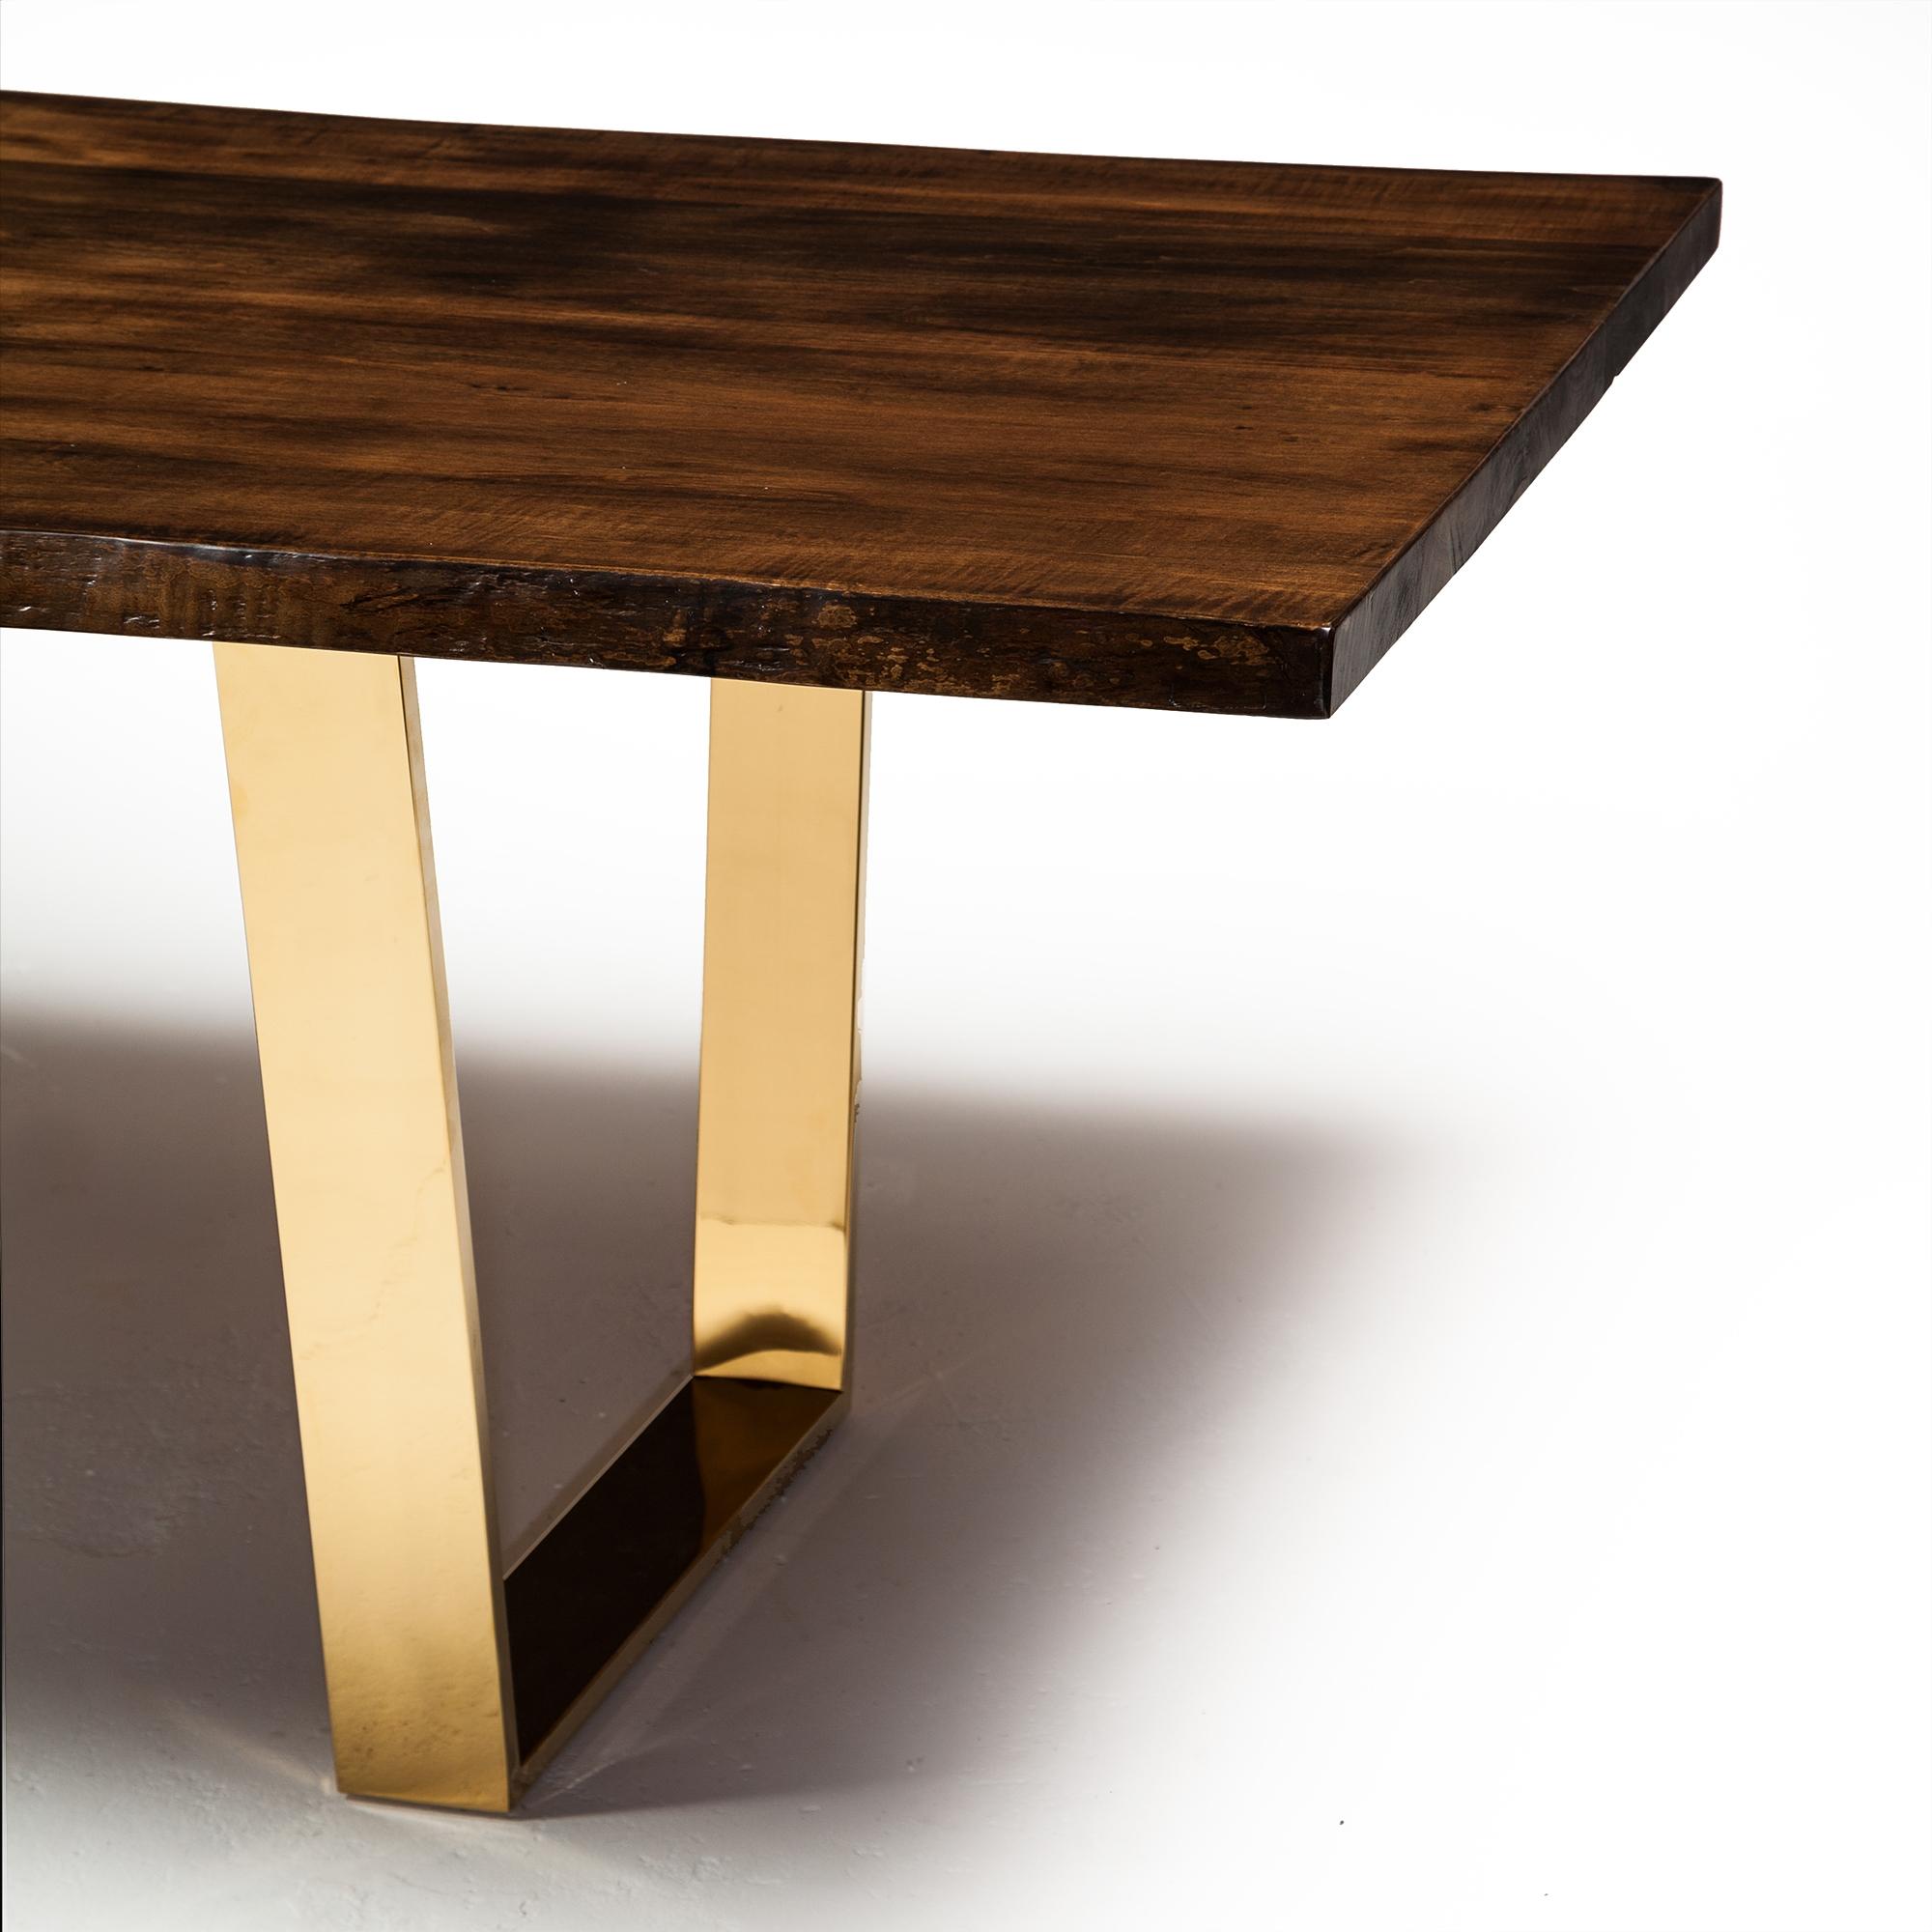 table room tables fb edge roca live walnut improve dining toronto canada ft black woodworks